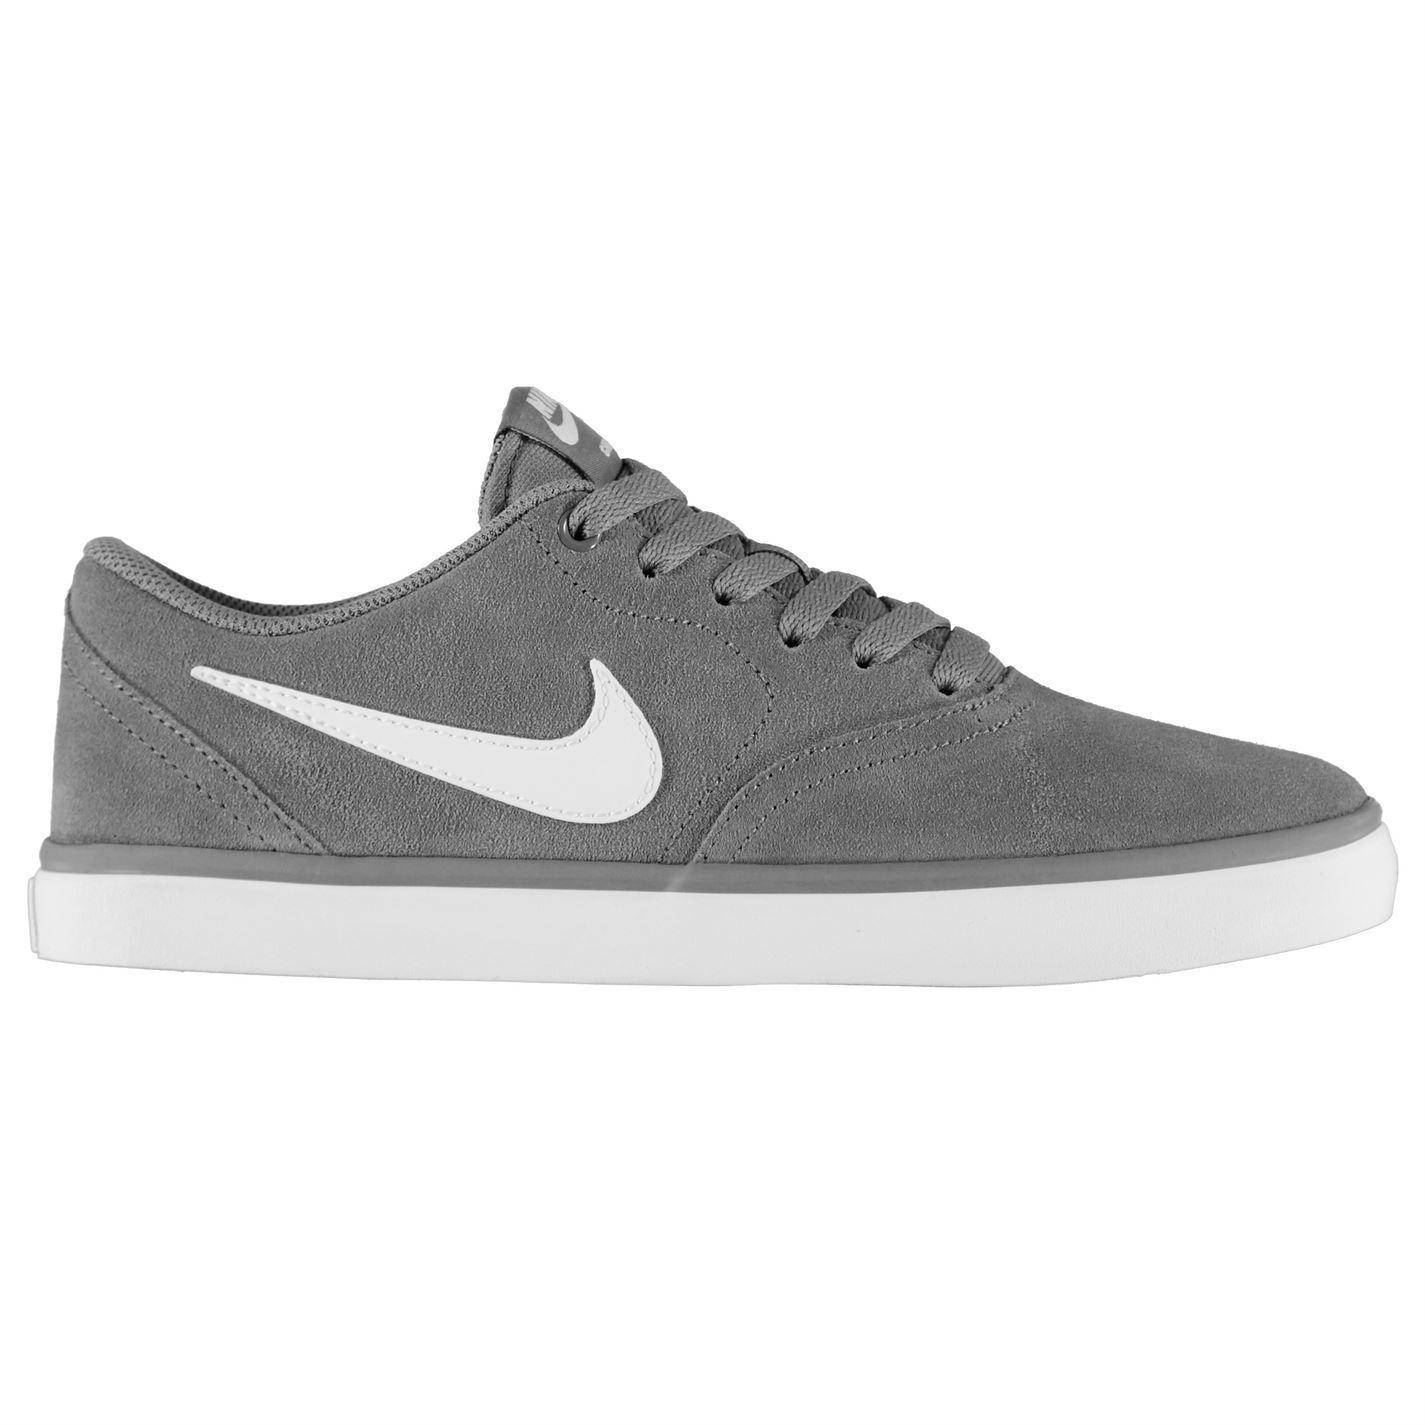 Zapatos casuales salvajes Nike Hombre SB De Cuadros Solar Hombre Skate Zapatos Zapatillas Calzado